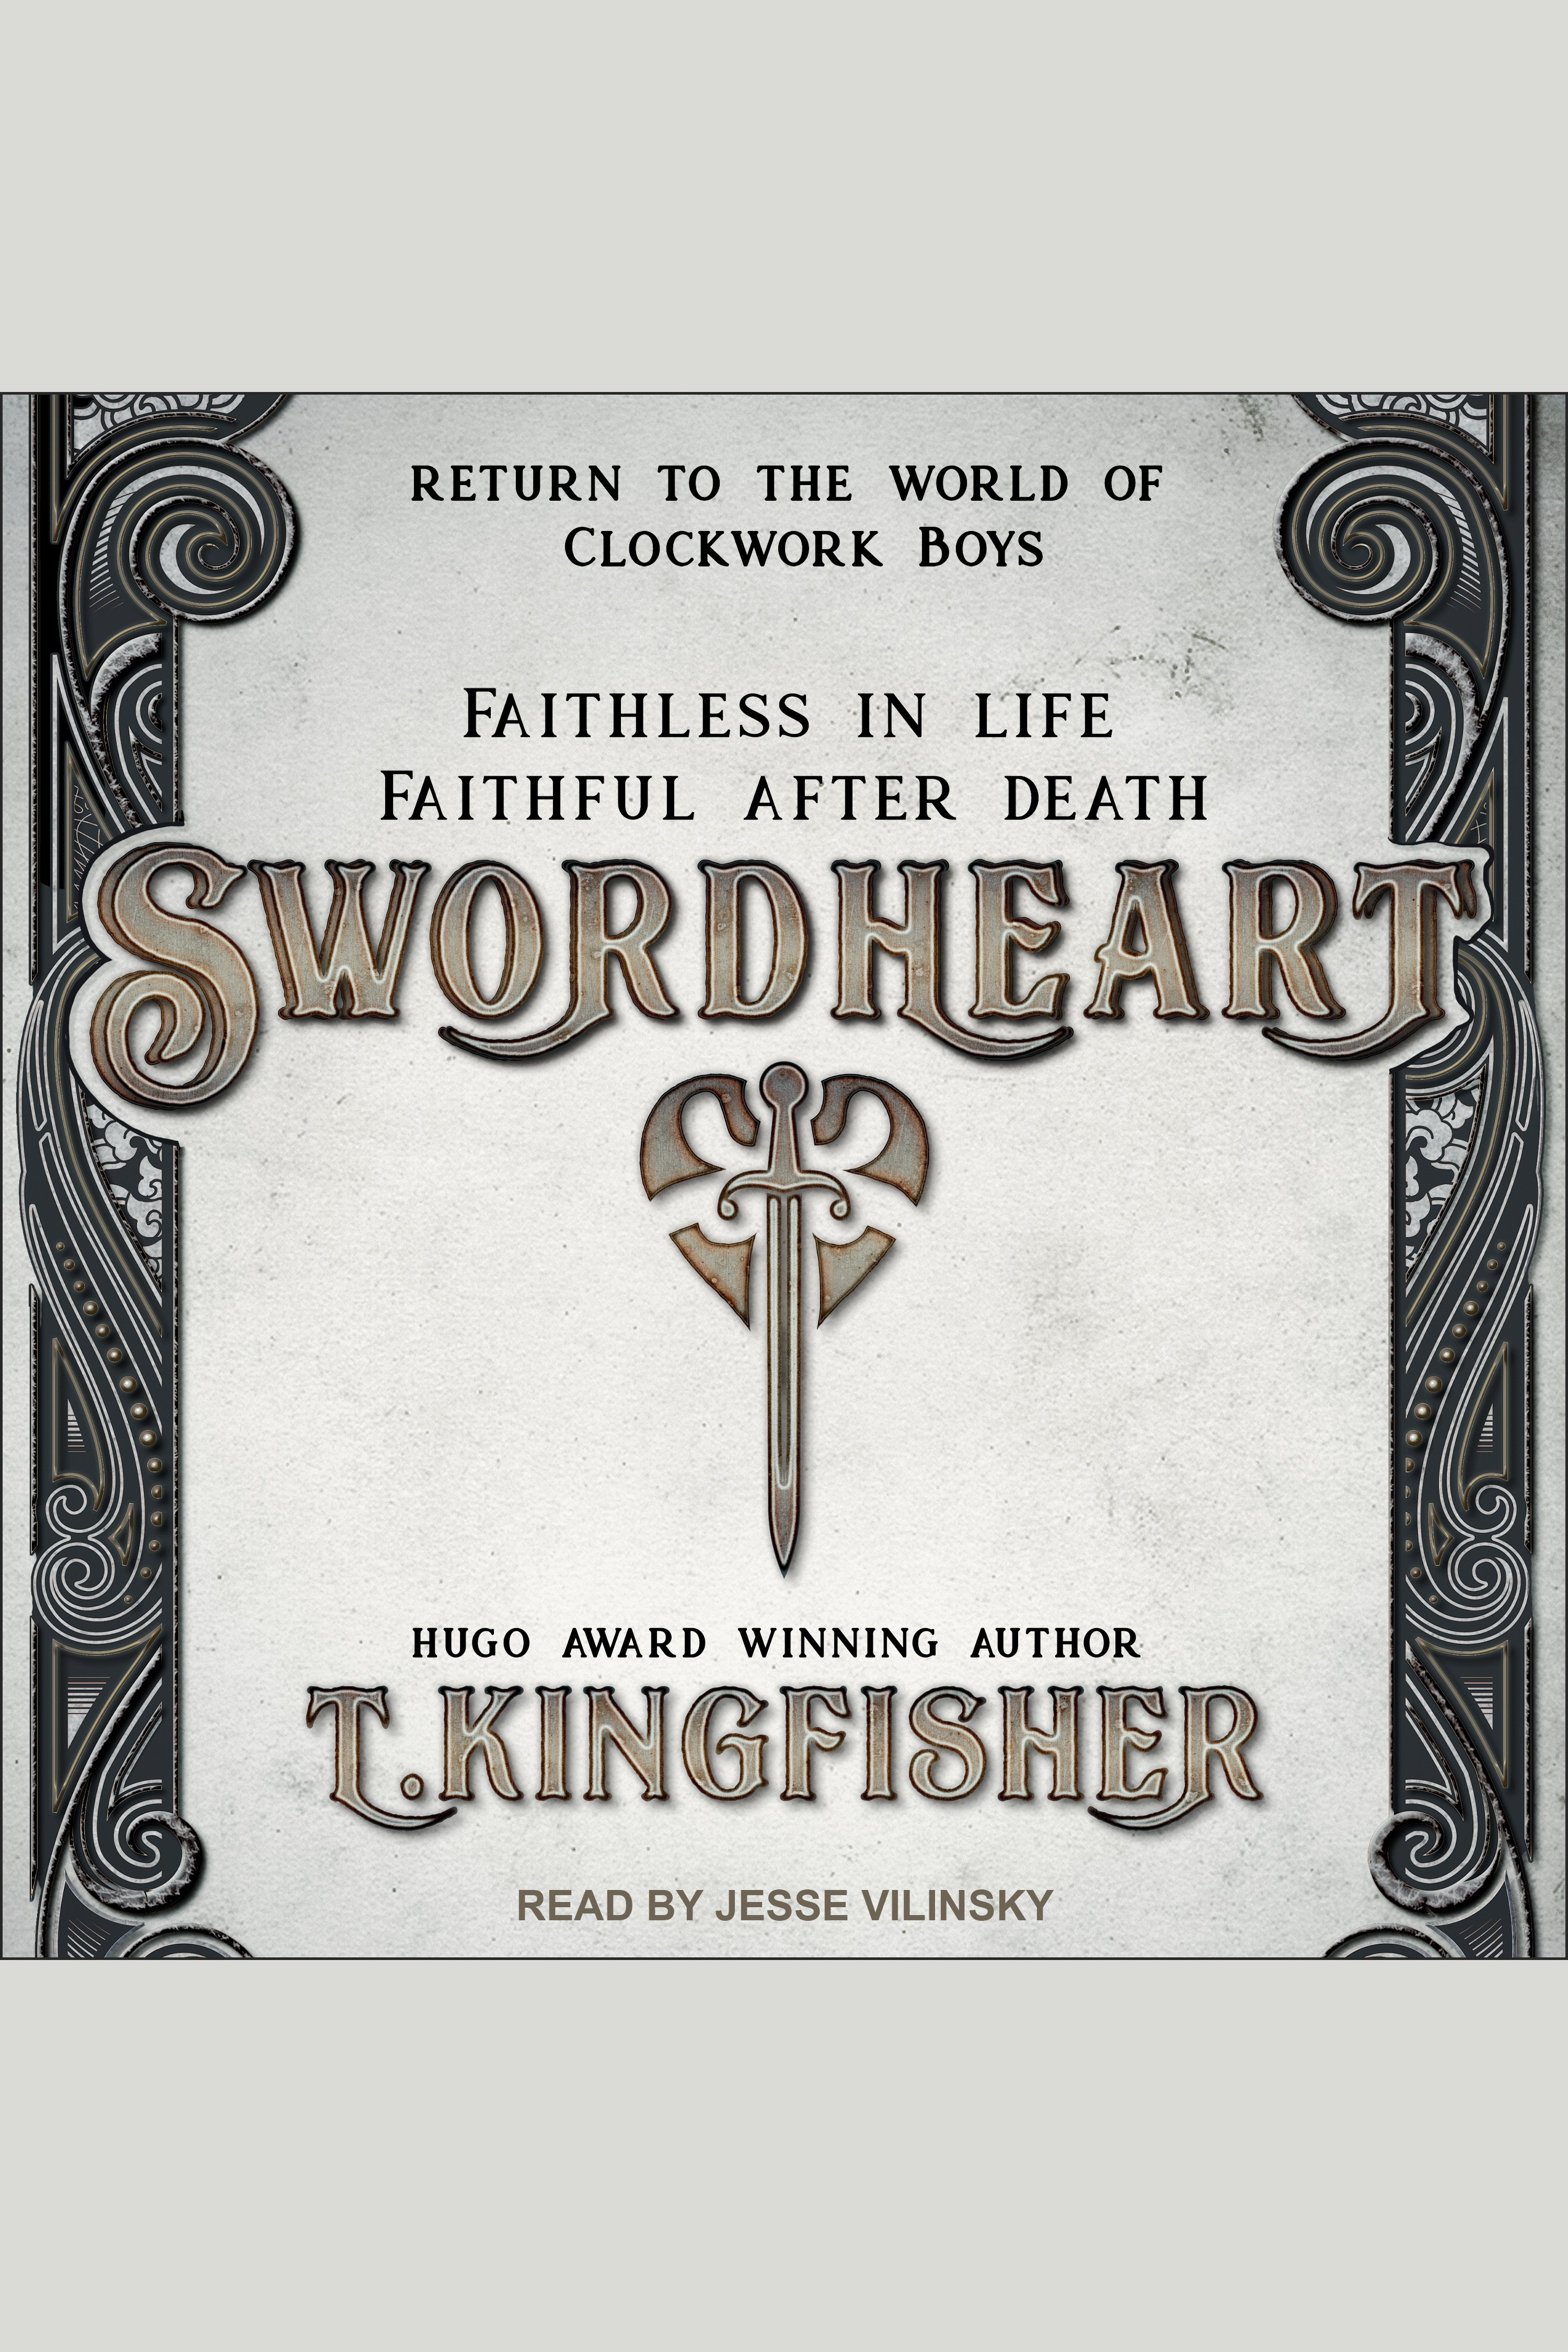 Cover Image of Swordheart